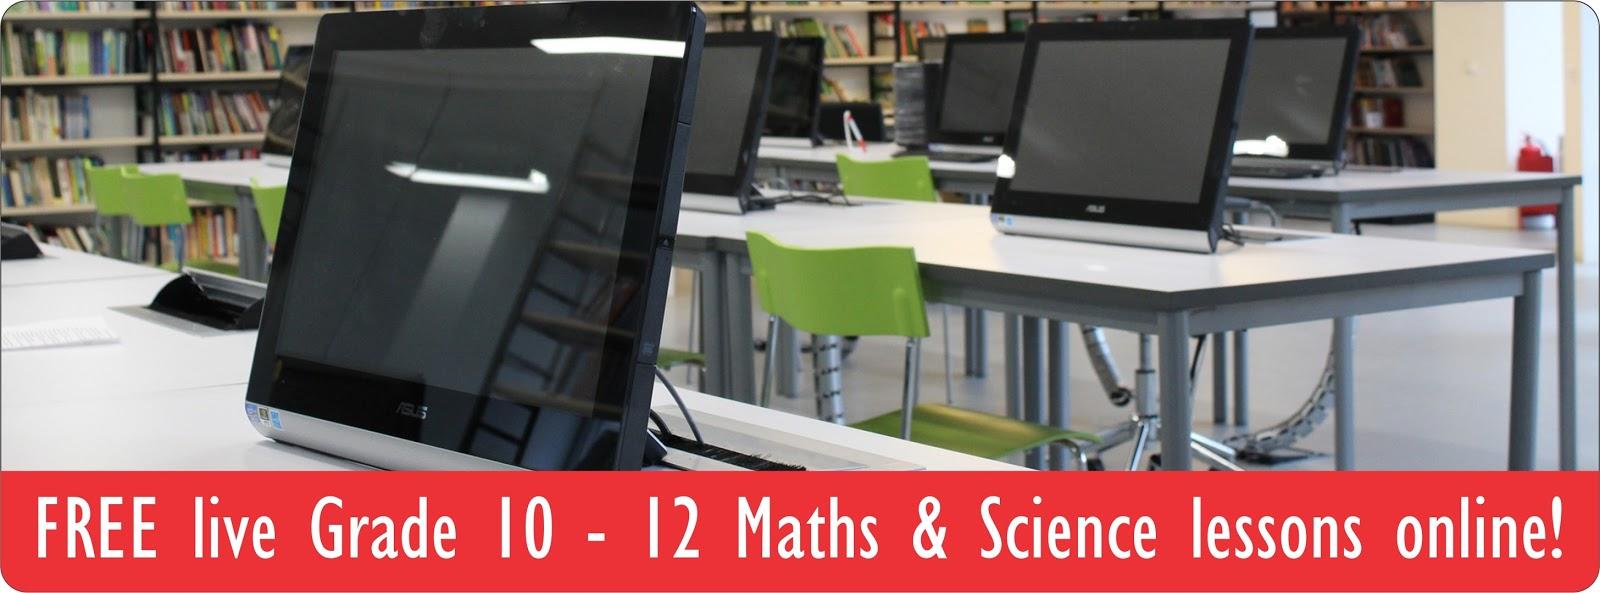 SchoolNet SA - IT's a Great Idea: Wow! Free Gr 10-12 Maths ...